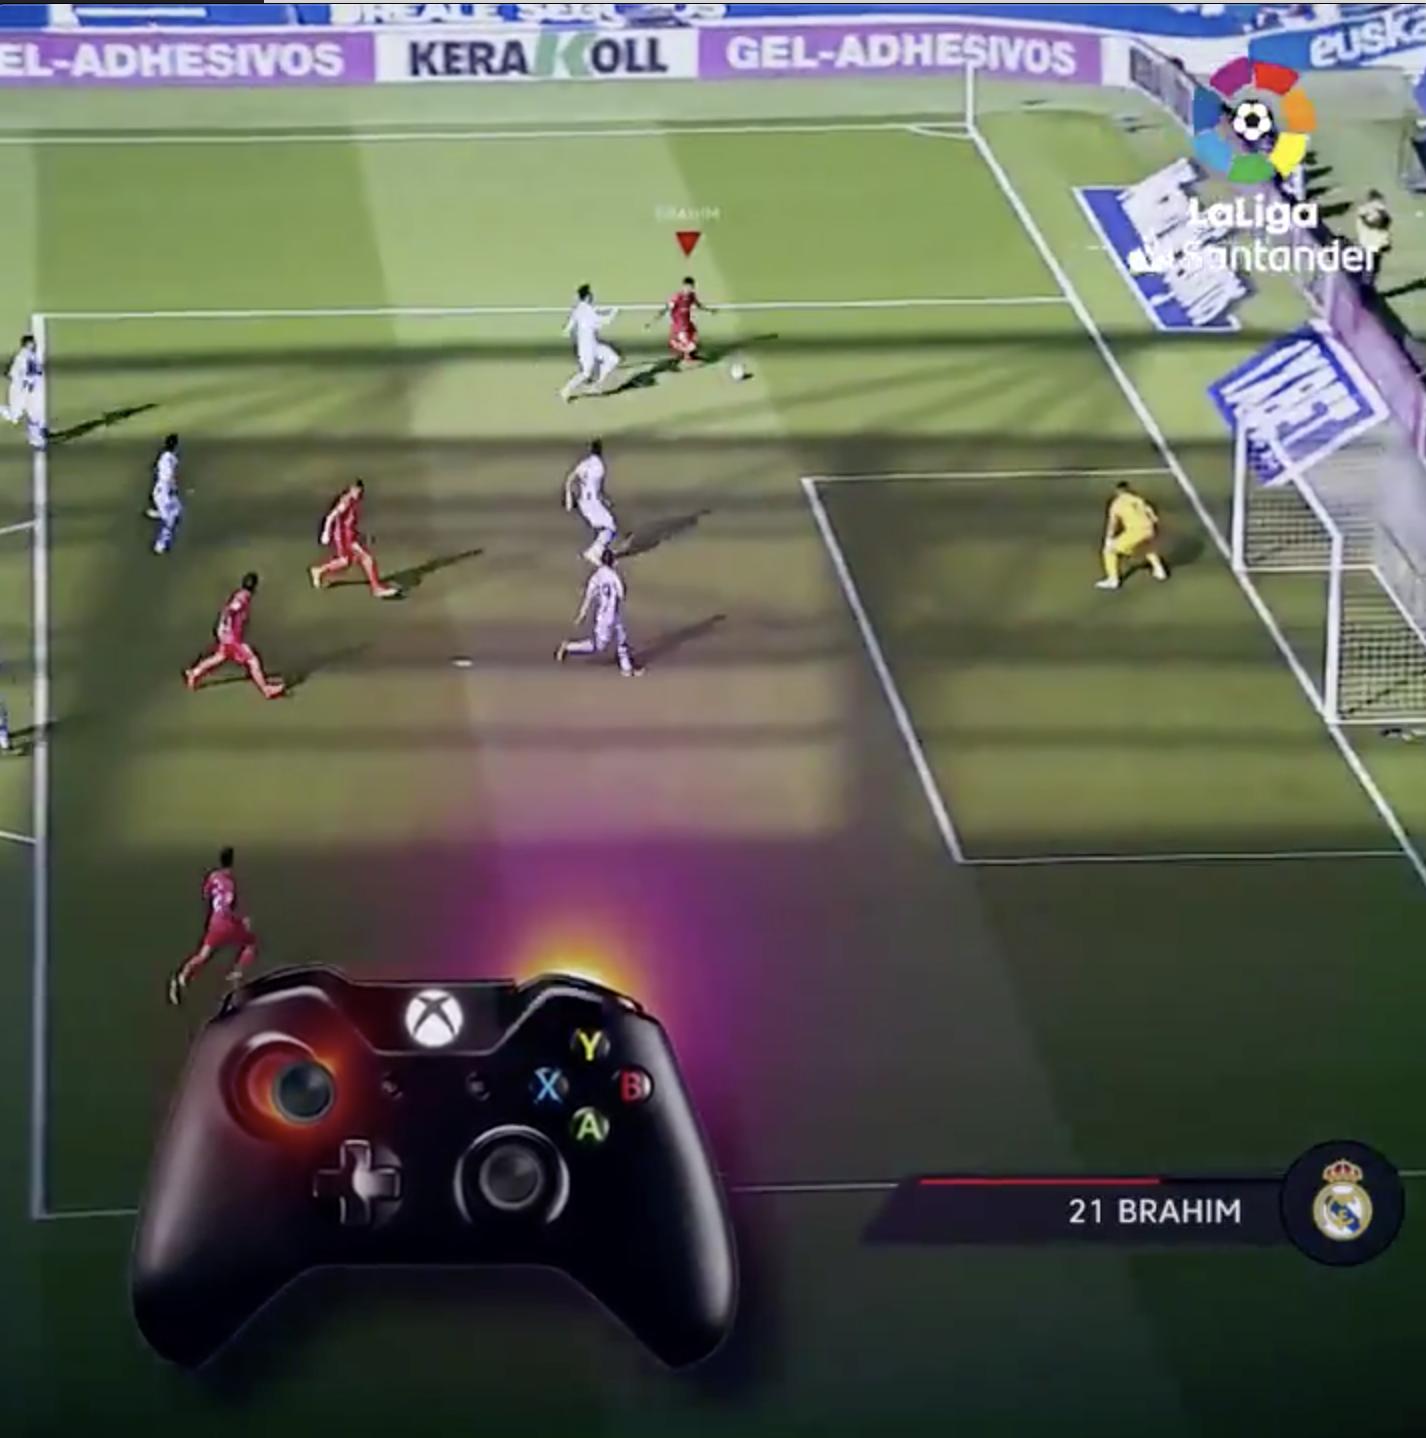 LaLiga action on Xbox controller